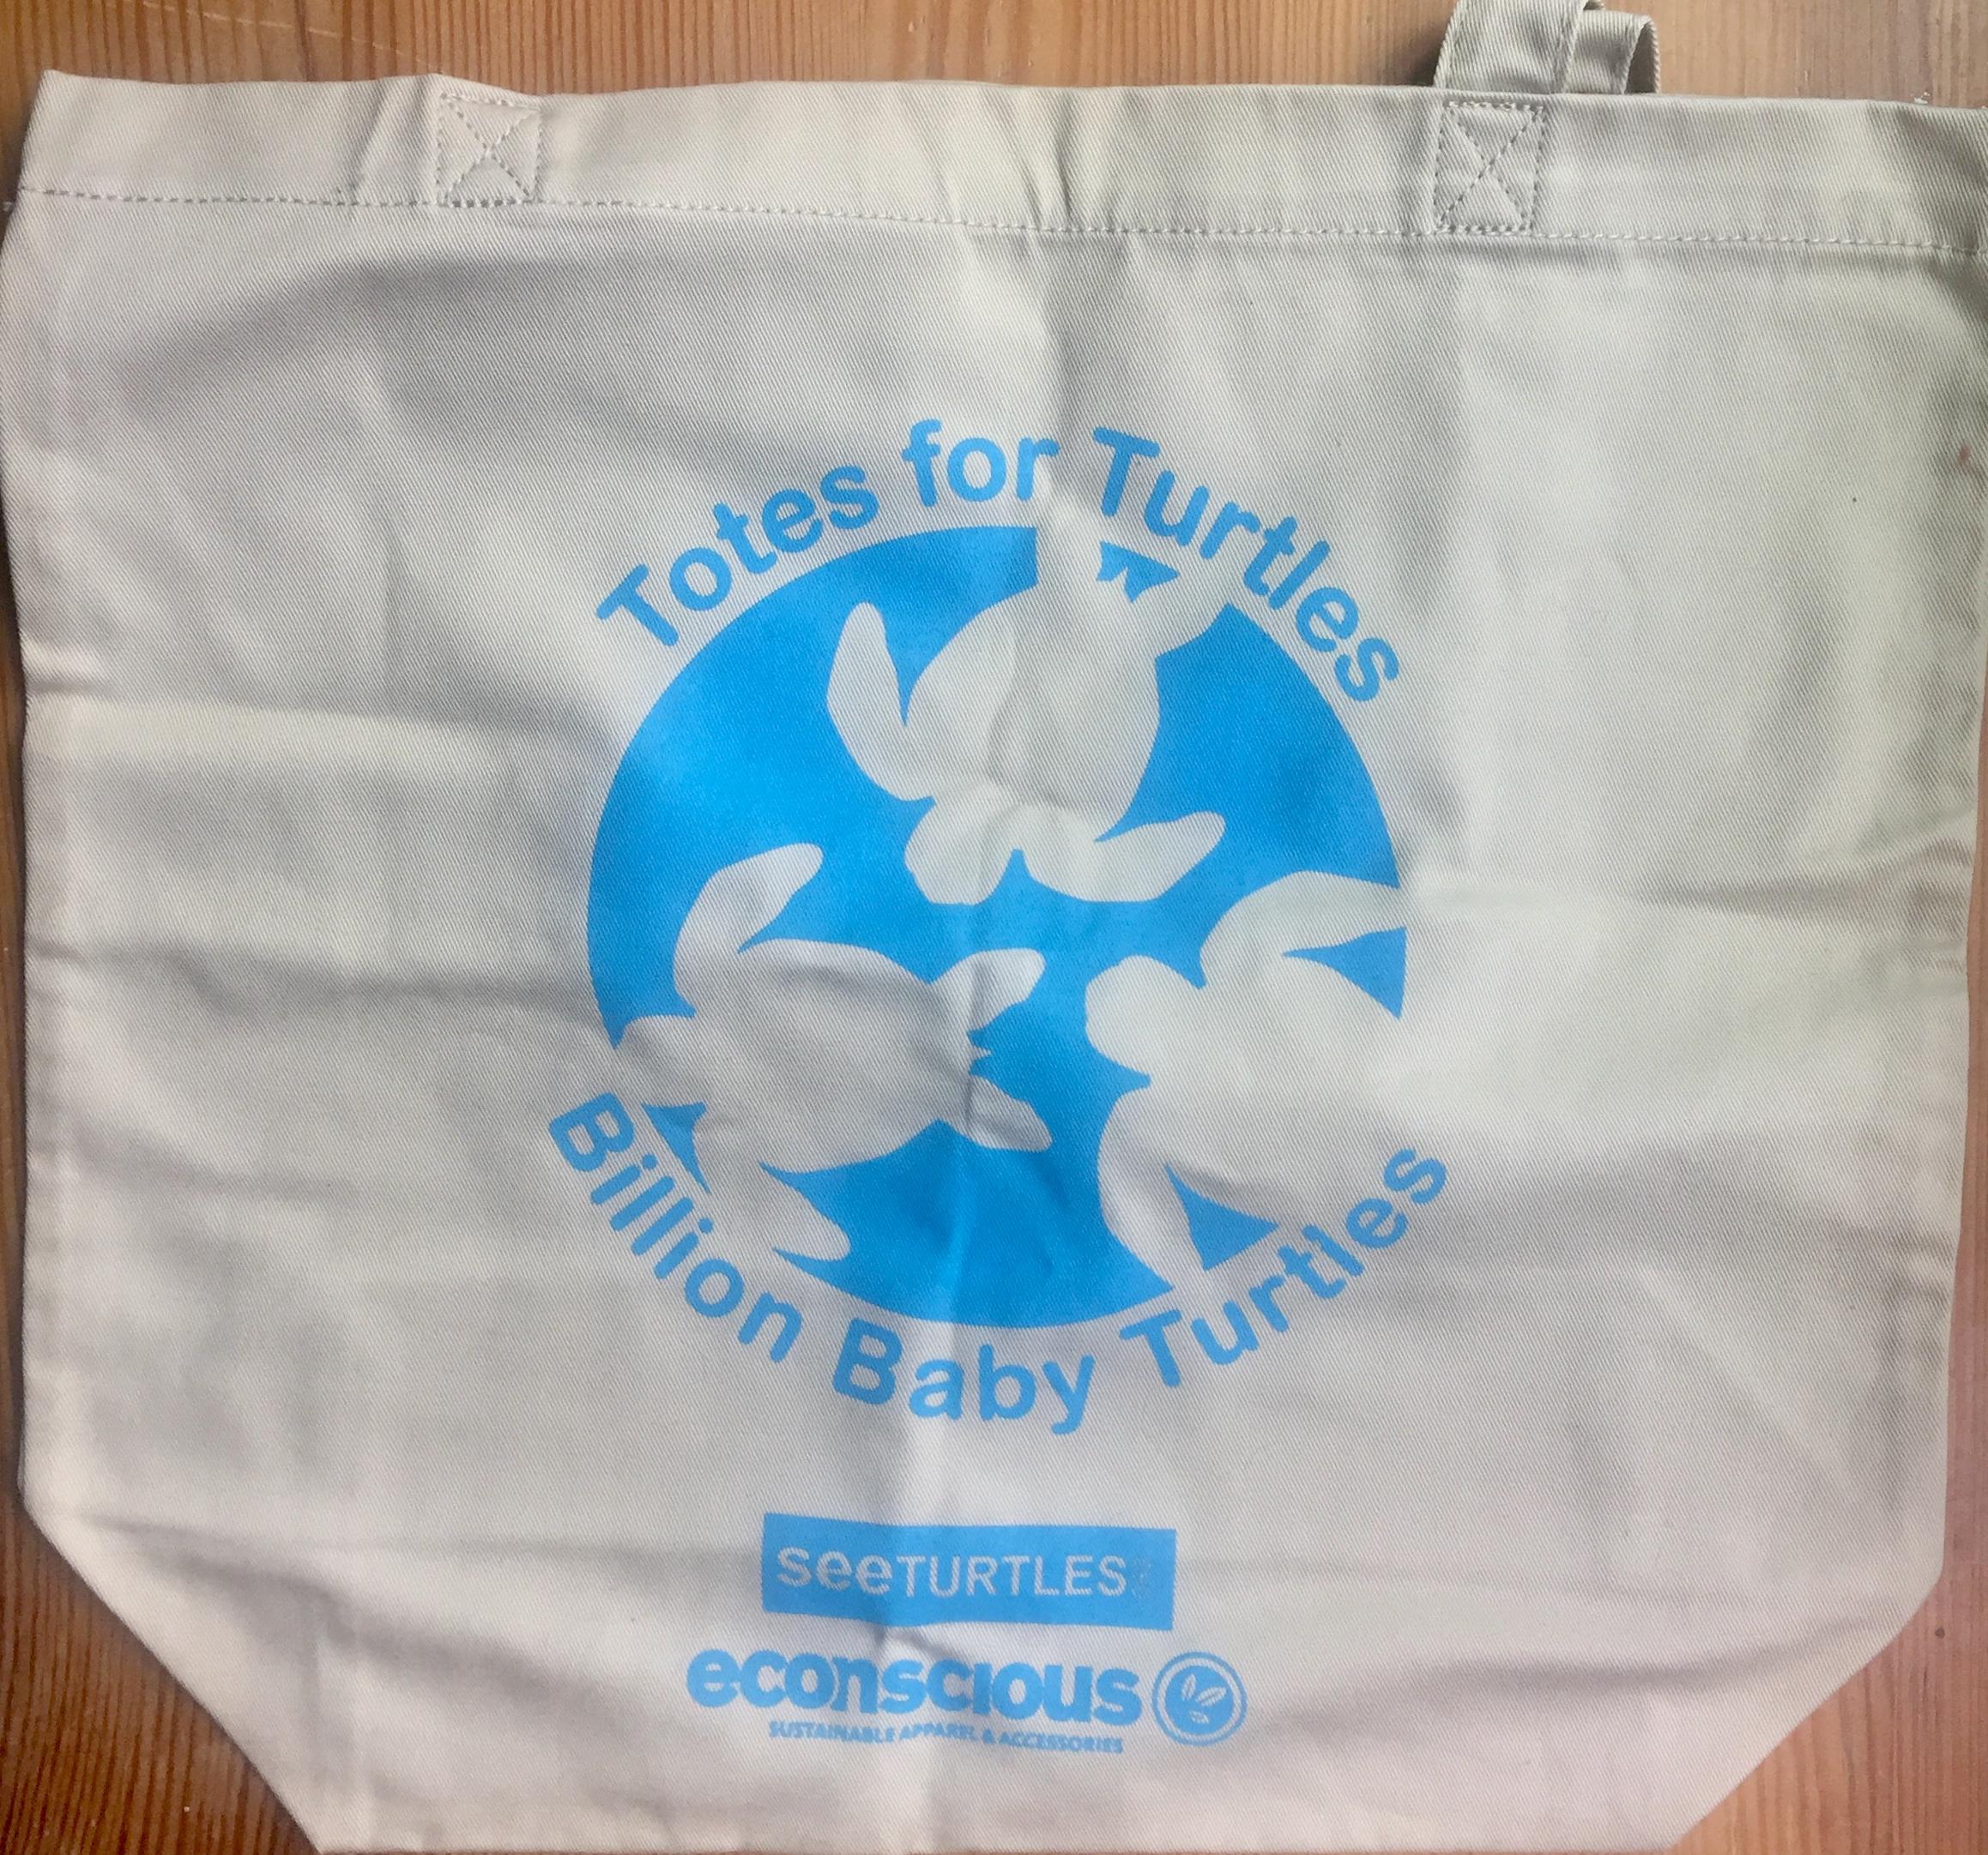 Billion Baby Turtles reusable shopping bag